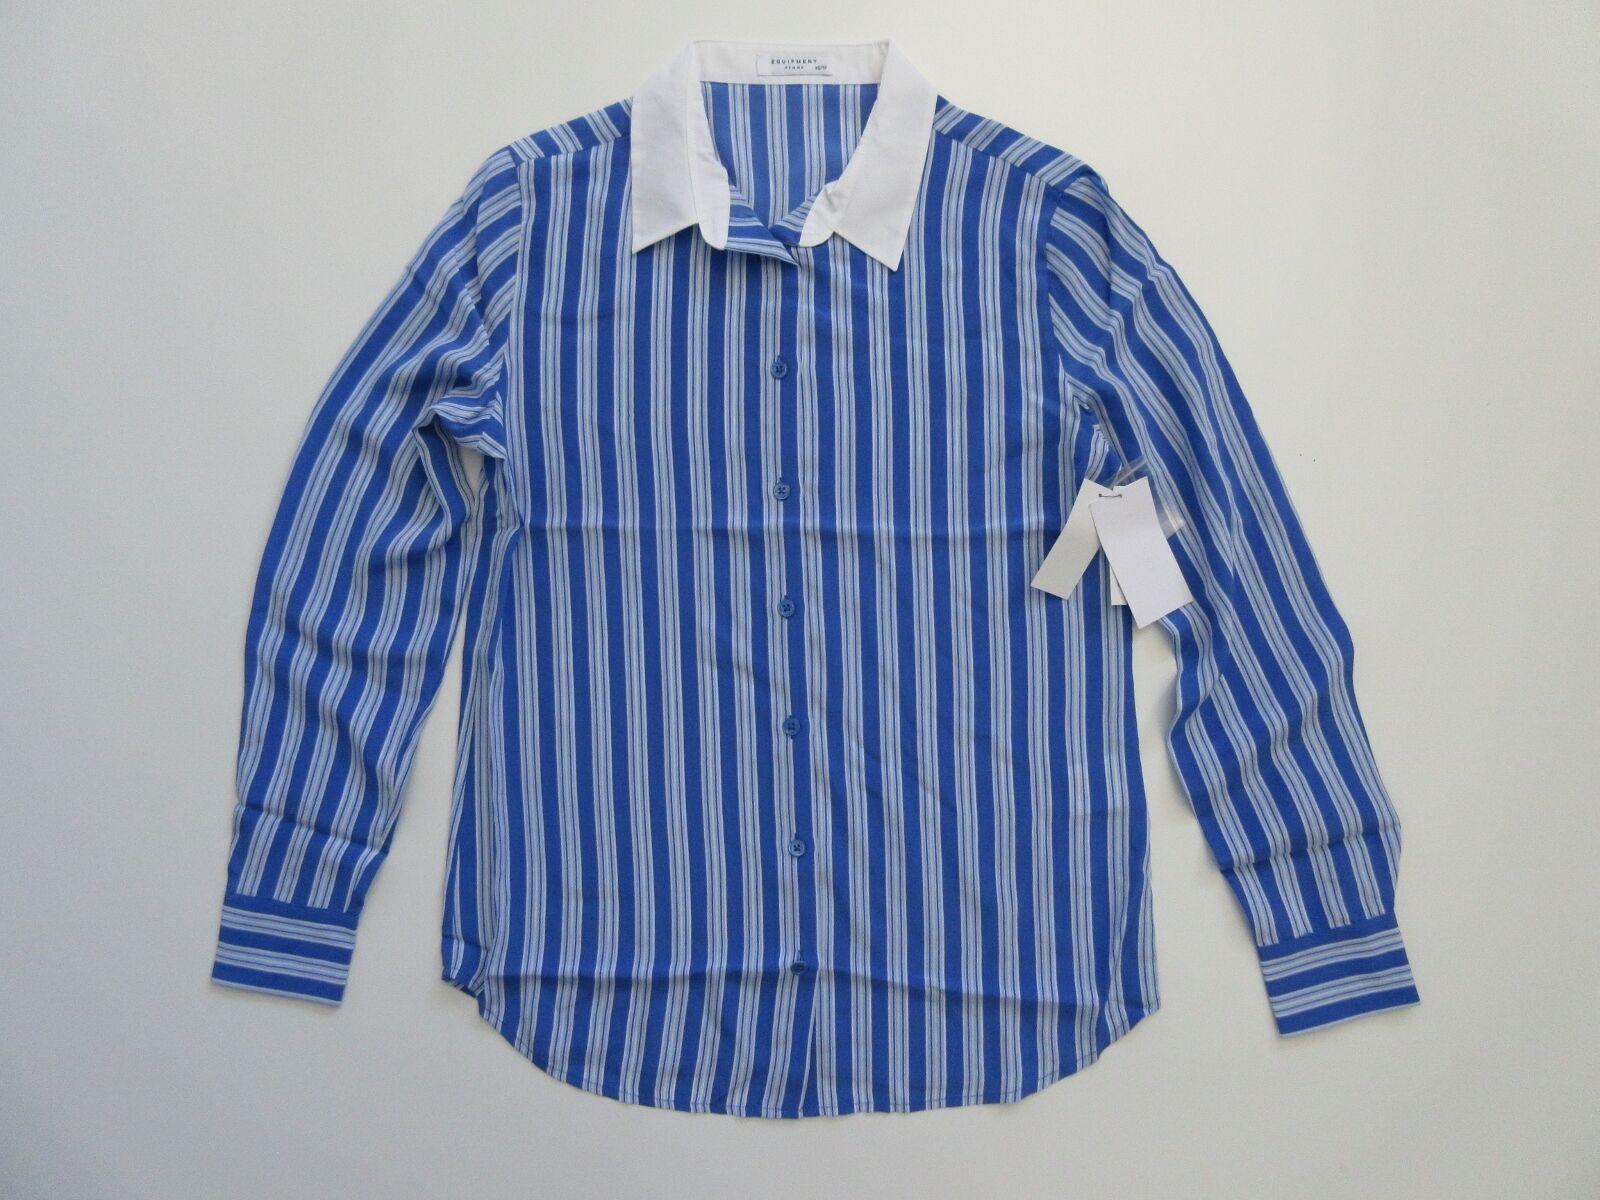 NWT Equipment Audrey in Amp Blau Stripe Contrast Collar Silk Button Shirt L